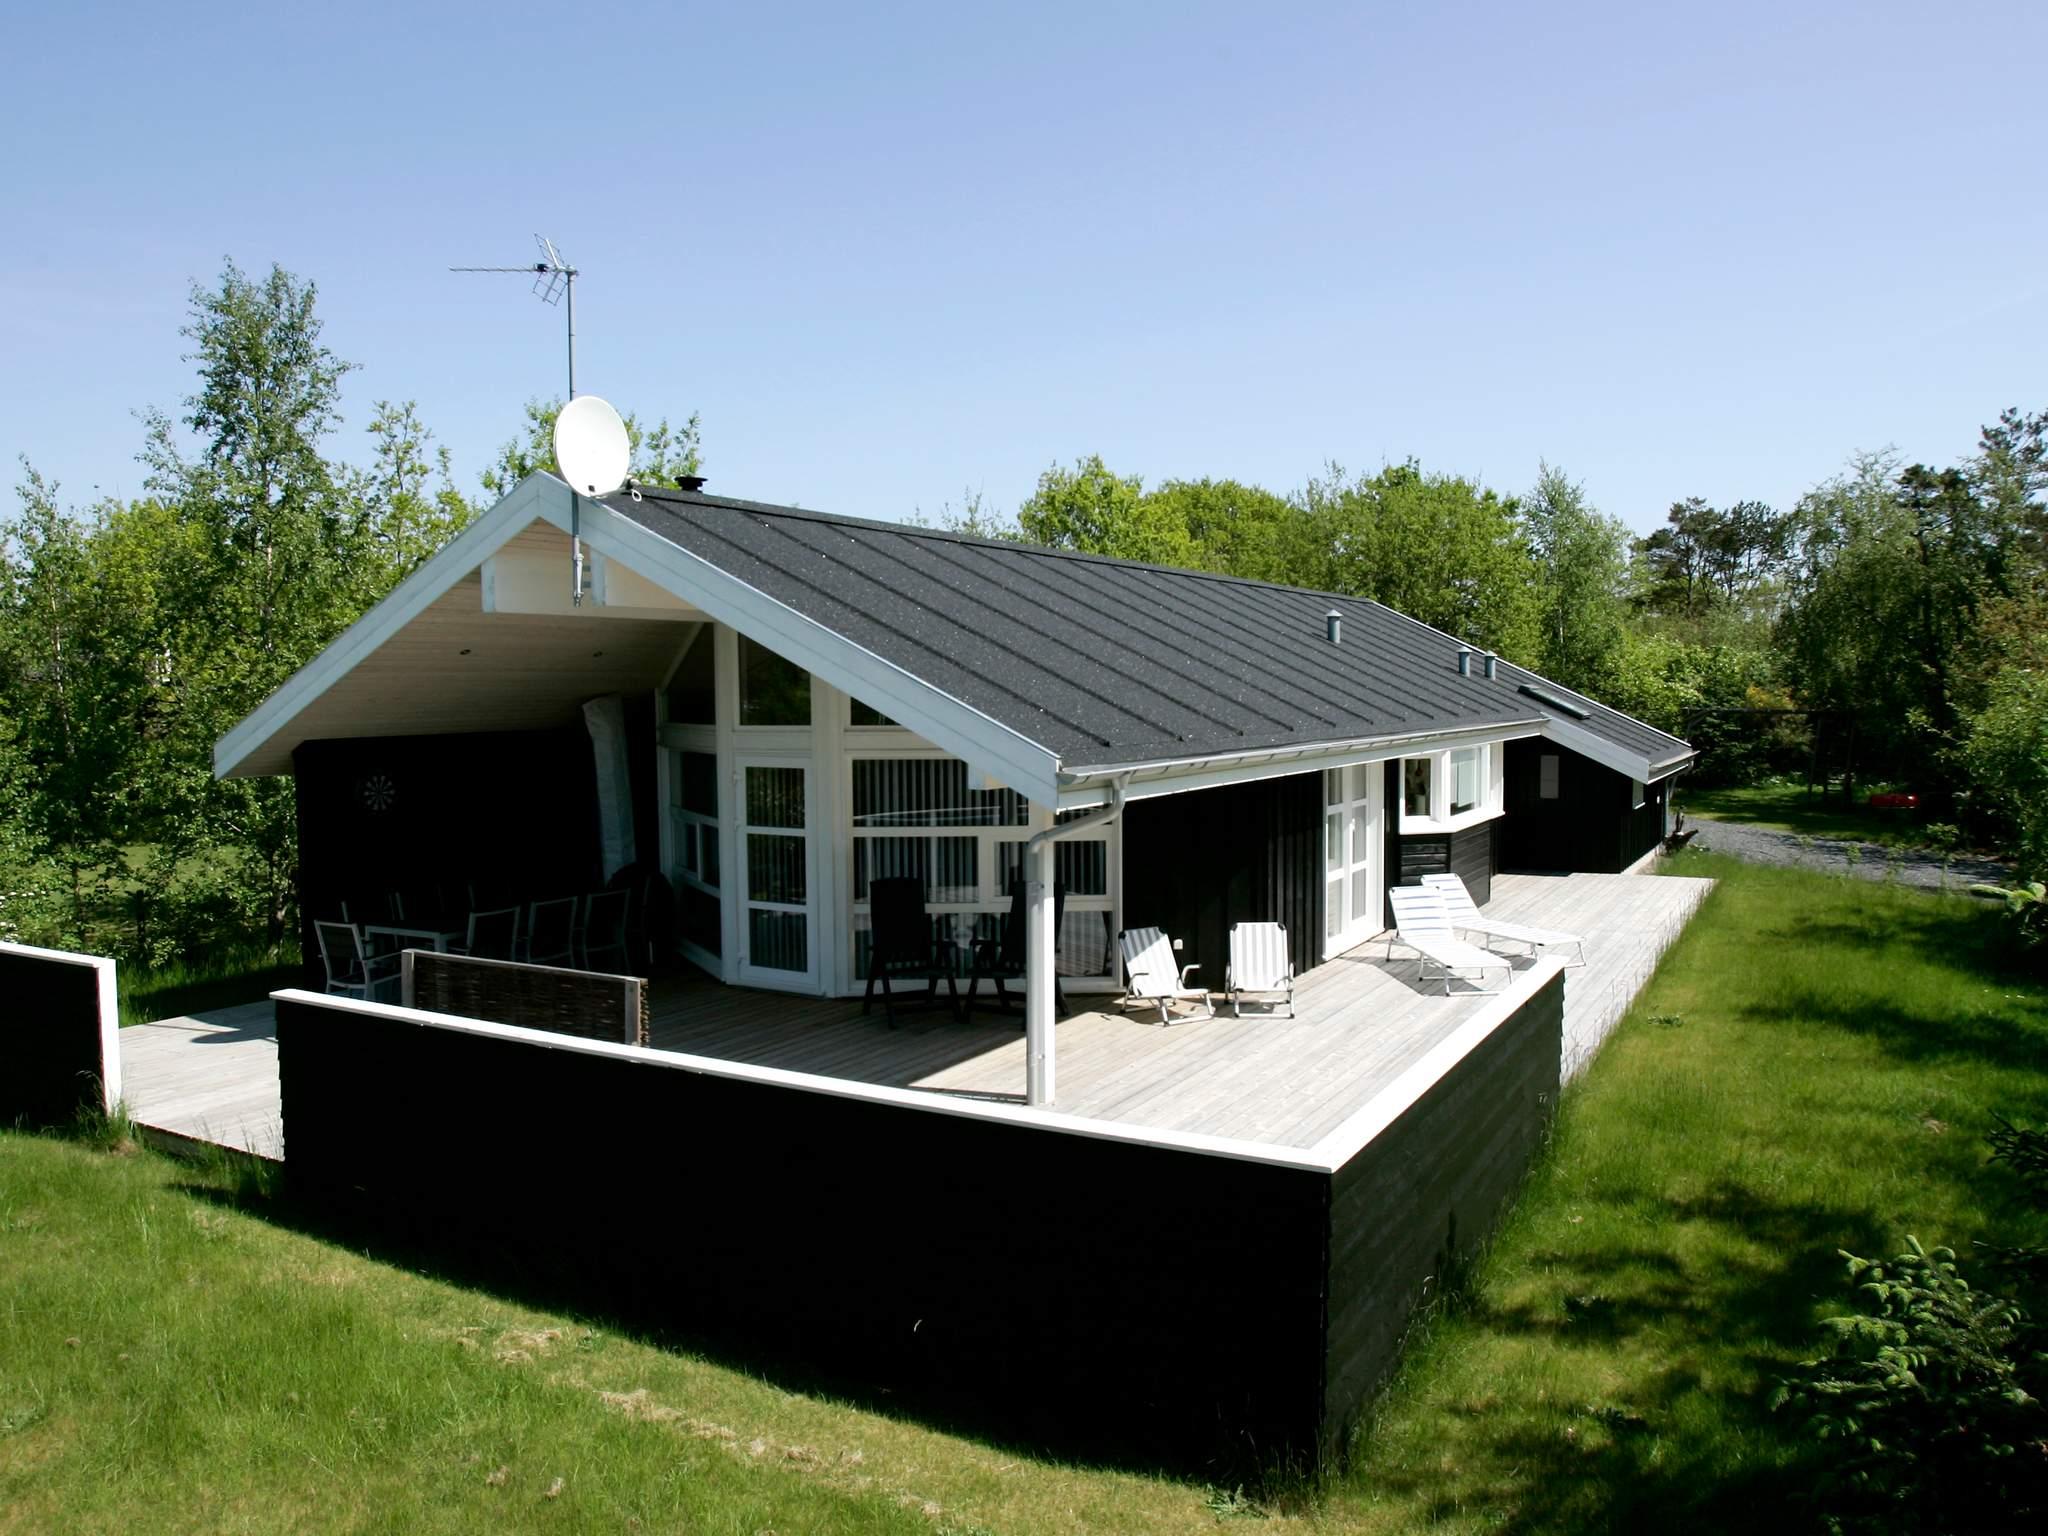 Ferienhaus Øster Hurup (377932), Øster Hurup, , Dänische Ostsee, Dänemark, Bild 1